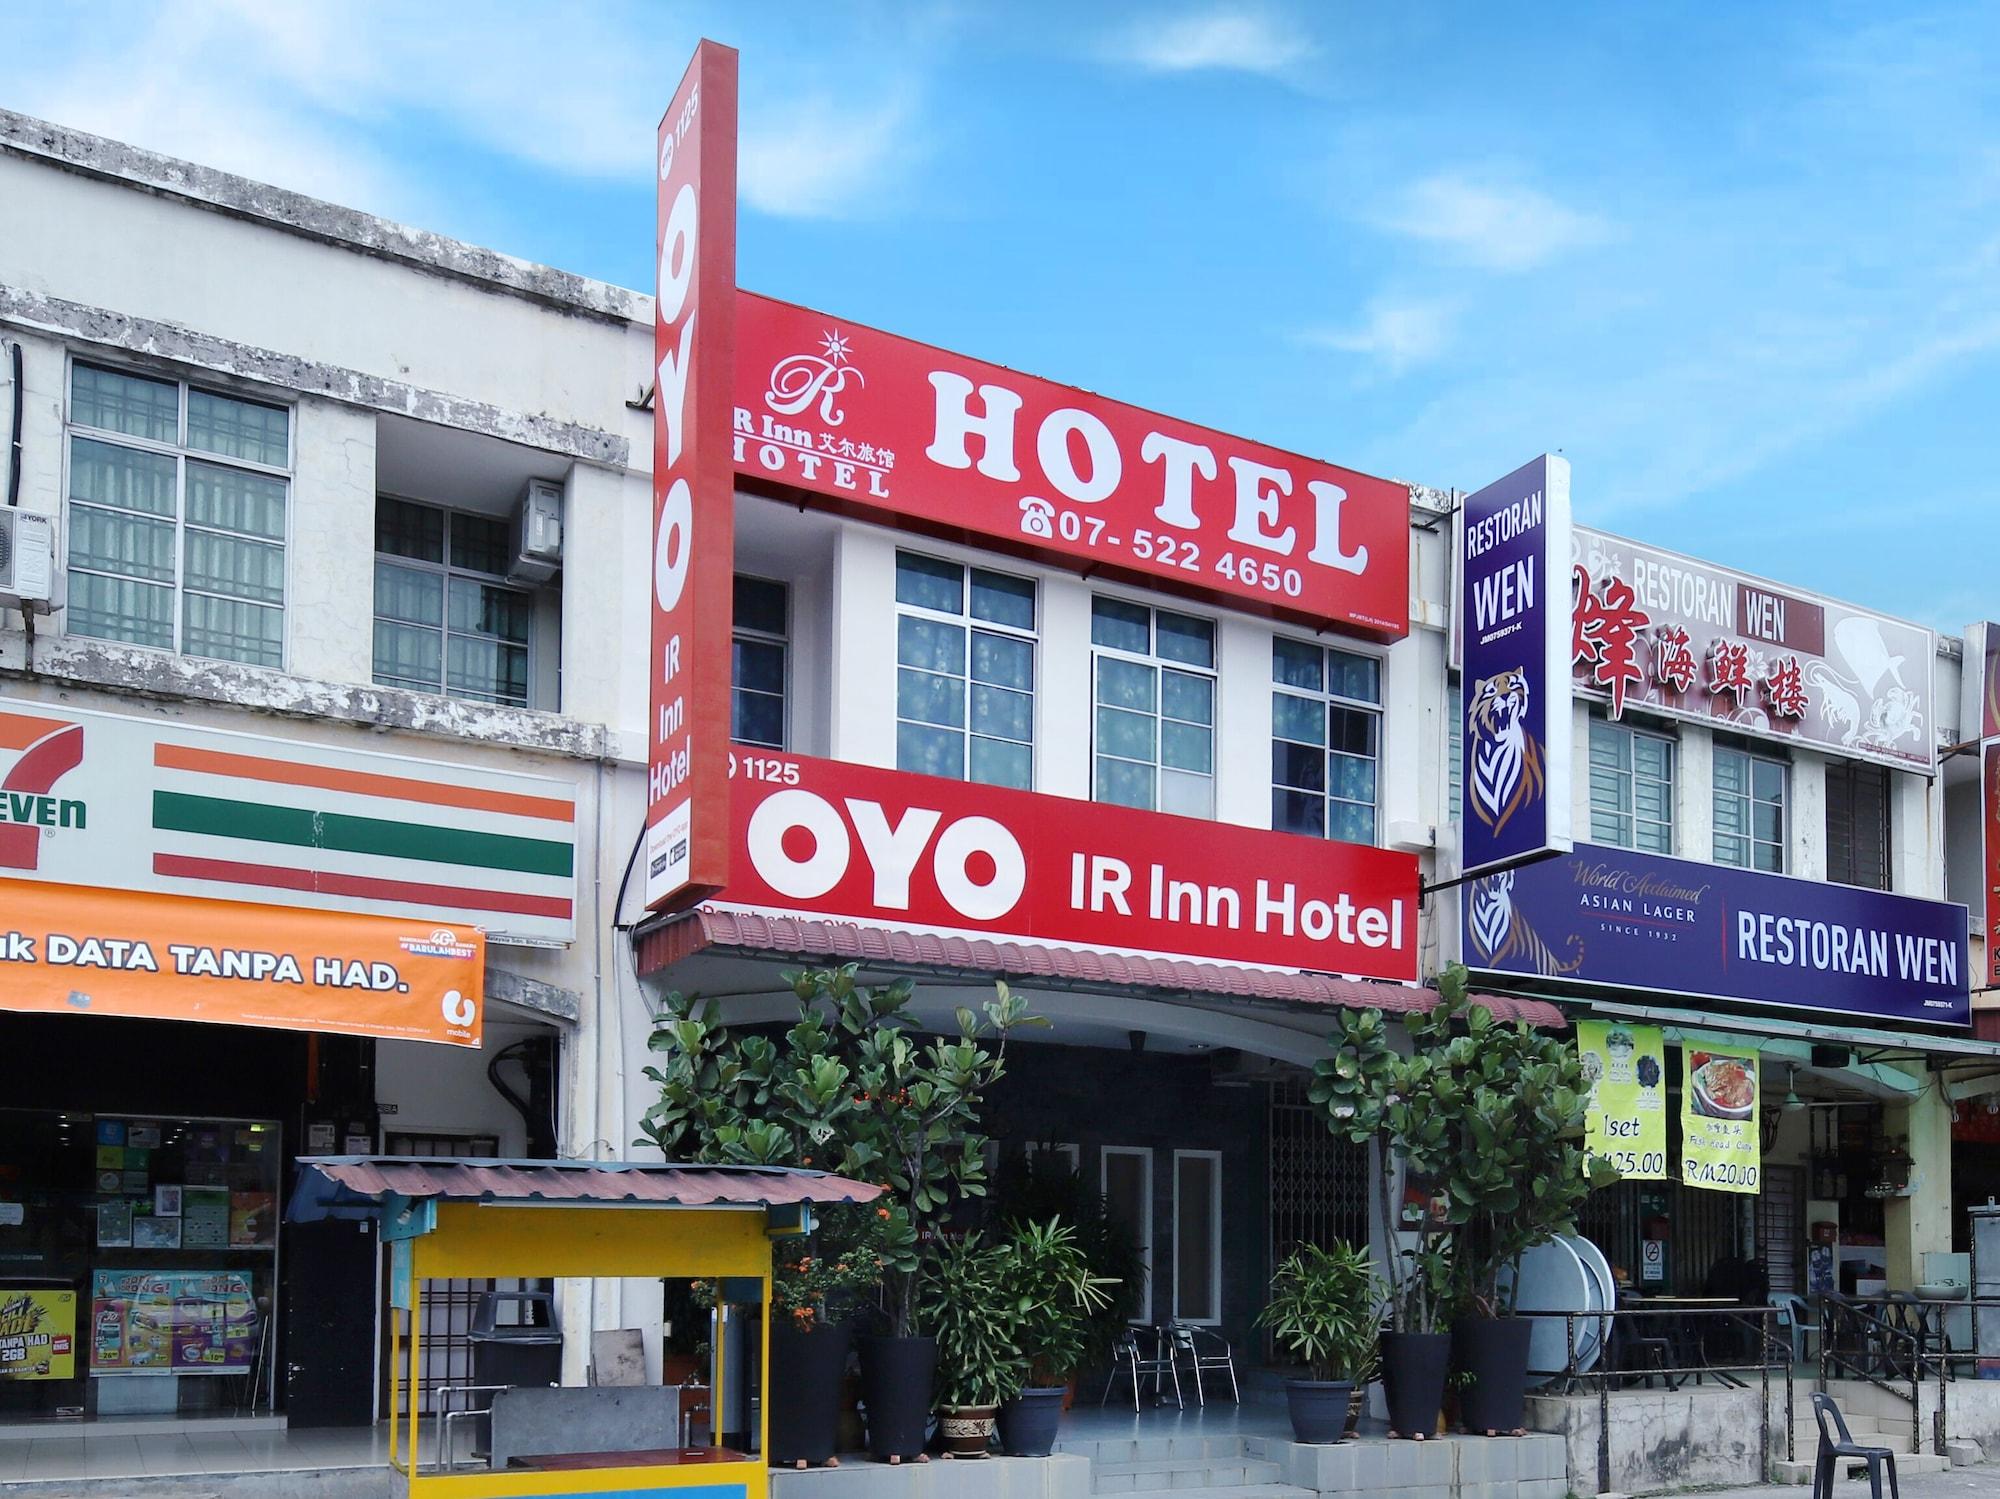 OYO 1125 IR Inn Hotel, Johor Bahru